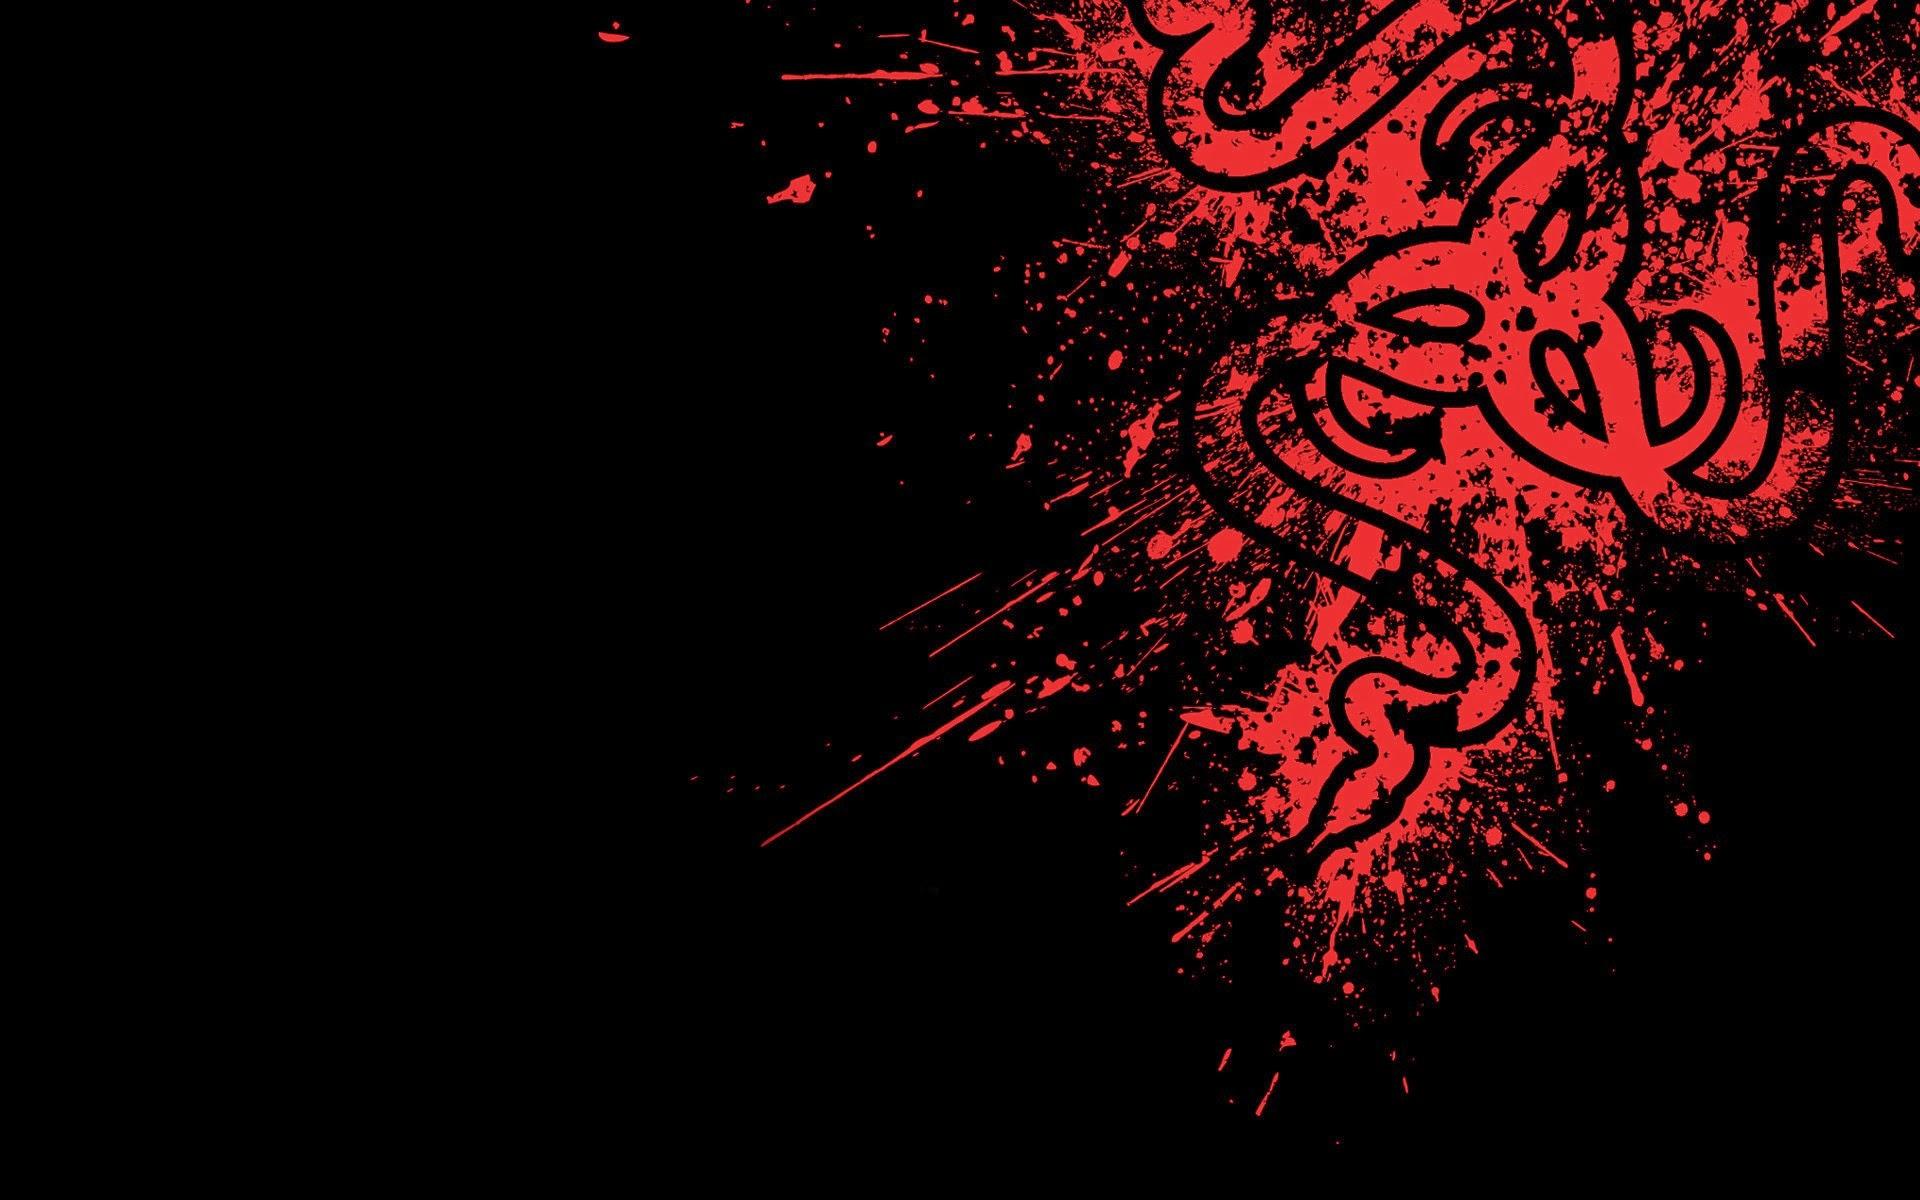 43+] Red Razer Wallpaper HD on WallpaperSafari.